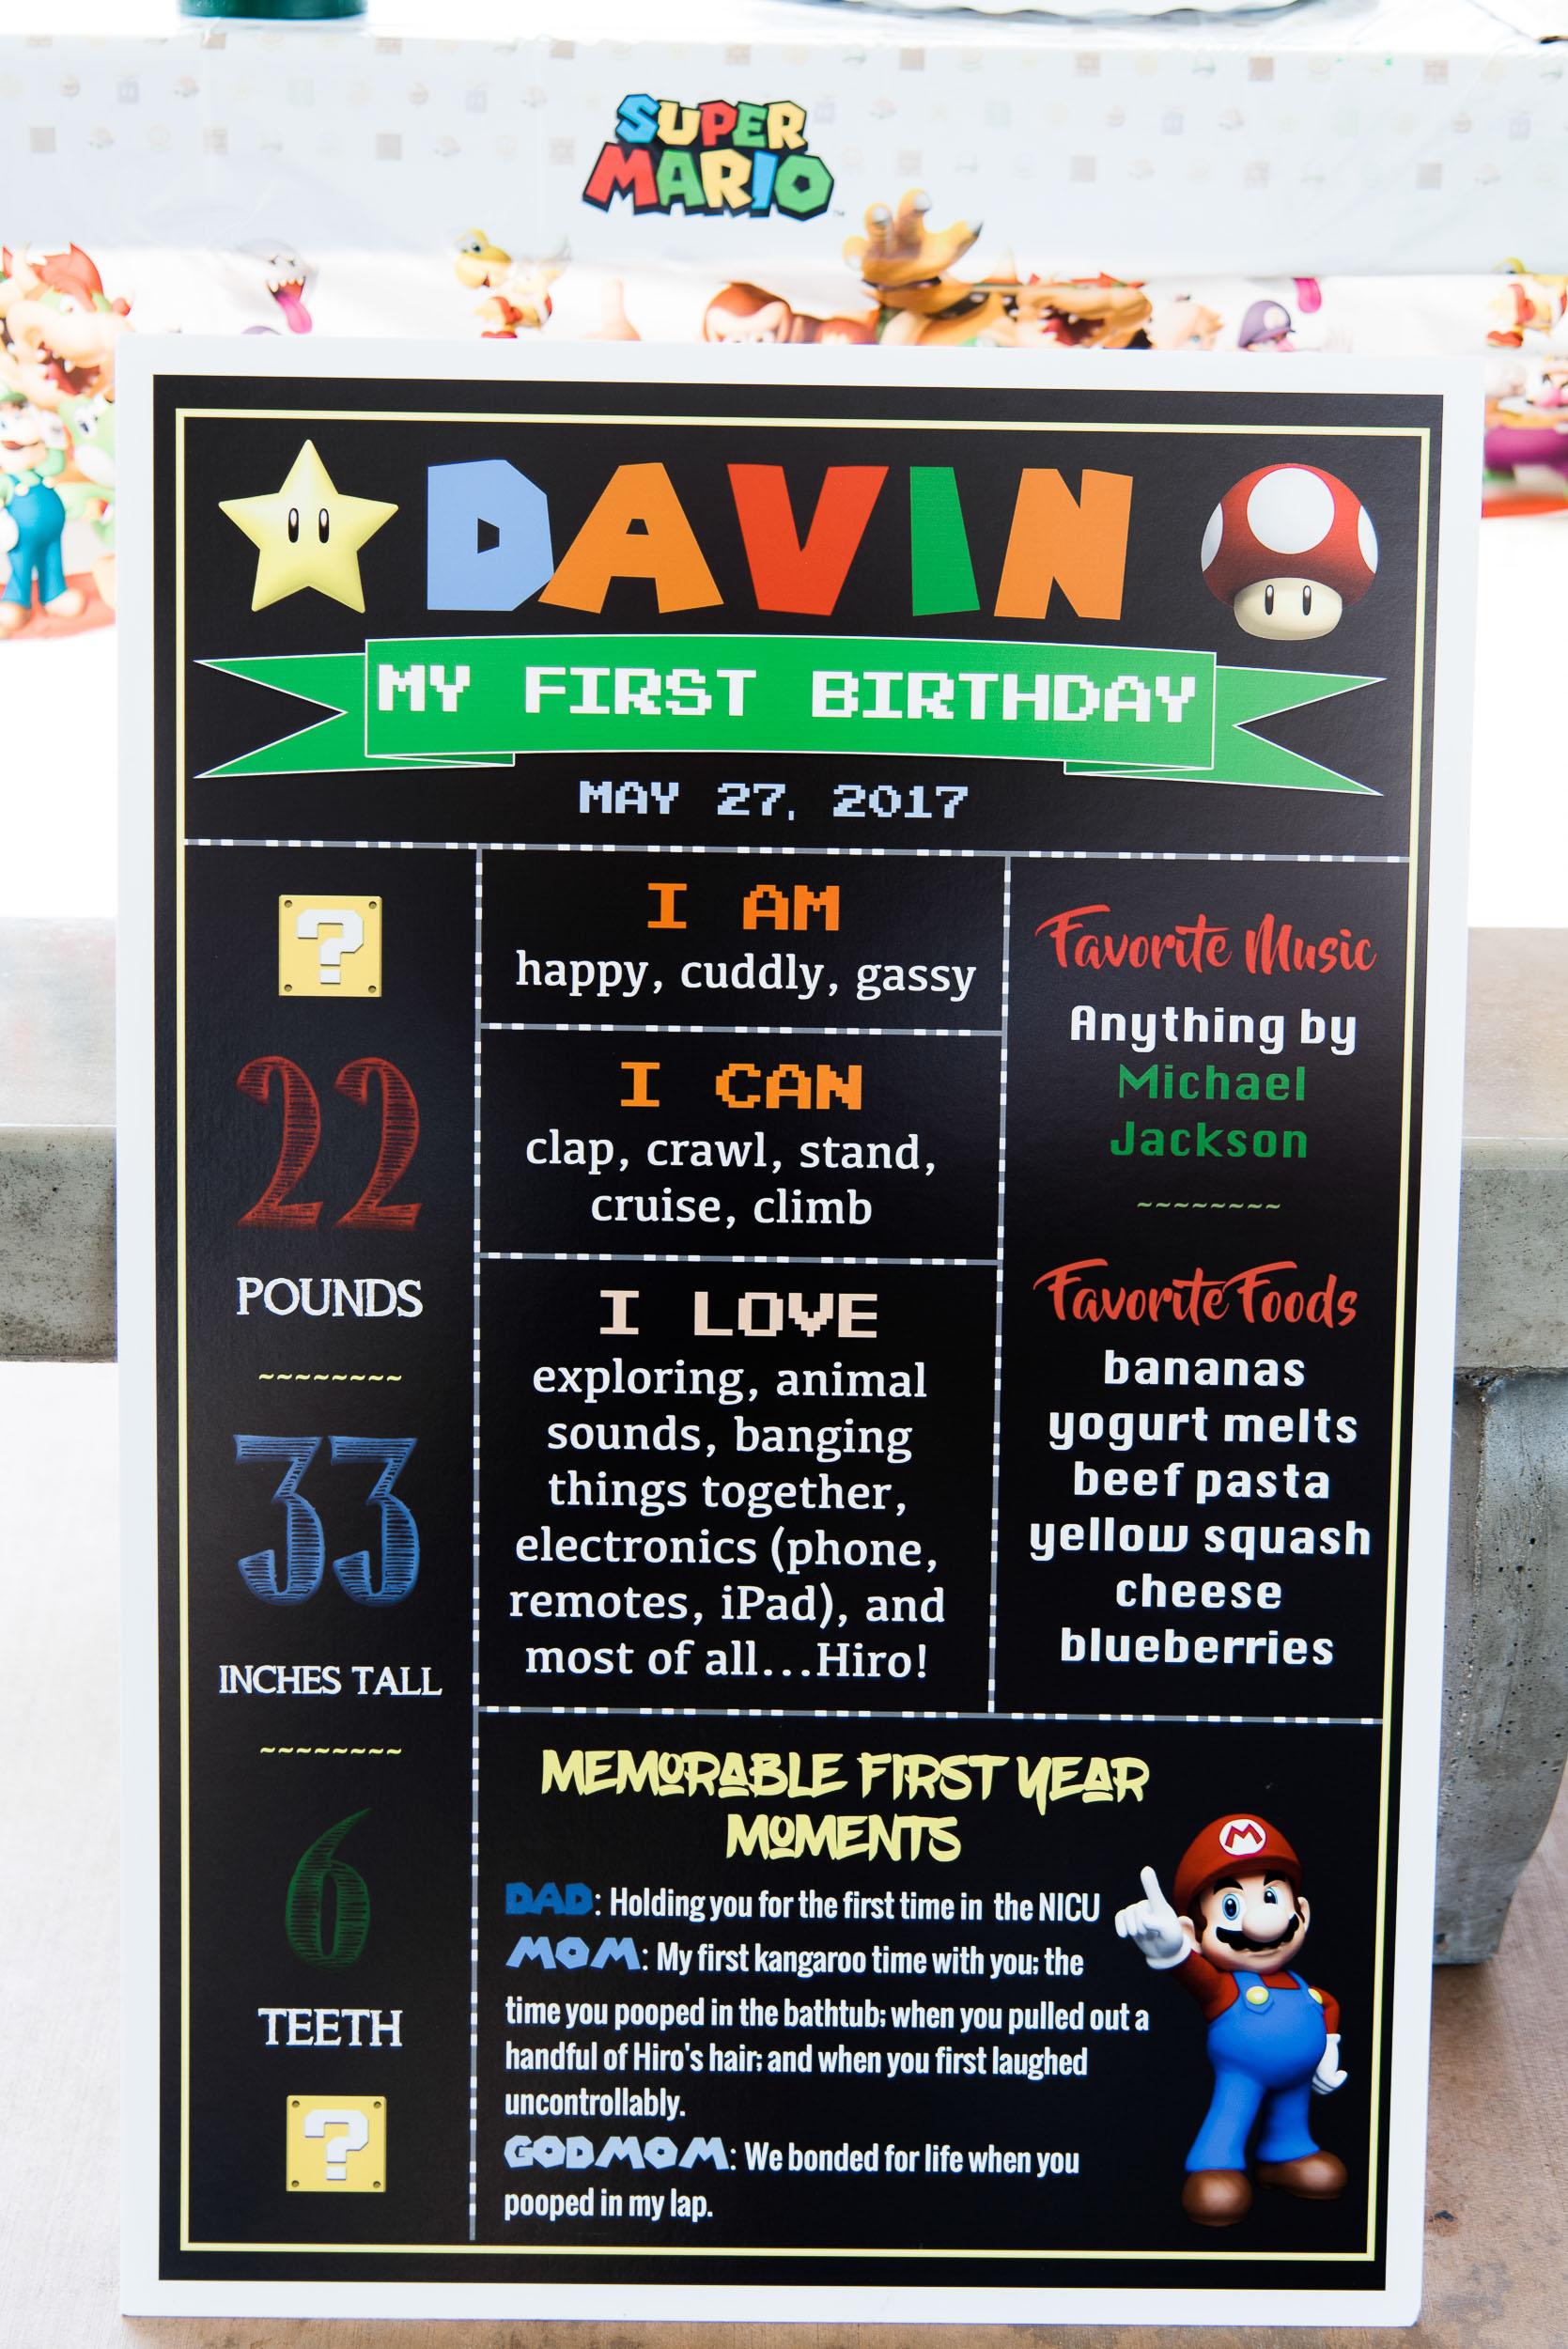 Bryan-Miraflor-Photography-Davin-First-Birthday-Irvine-20170603-0002.jpg